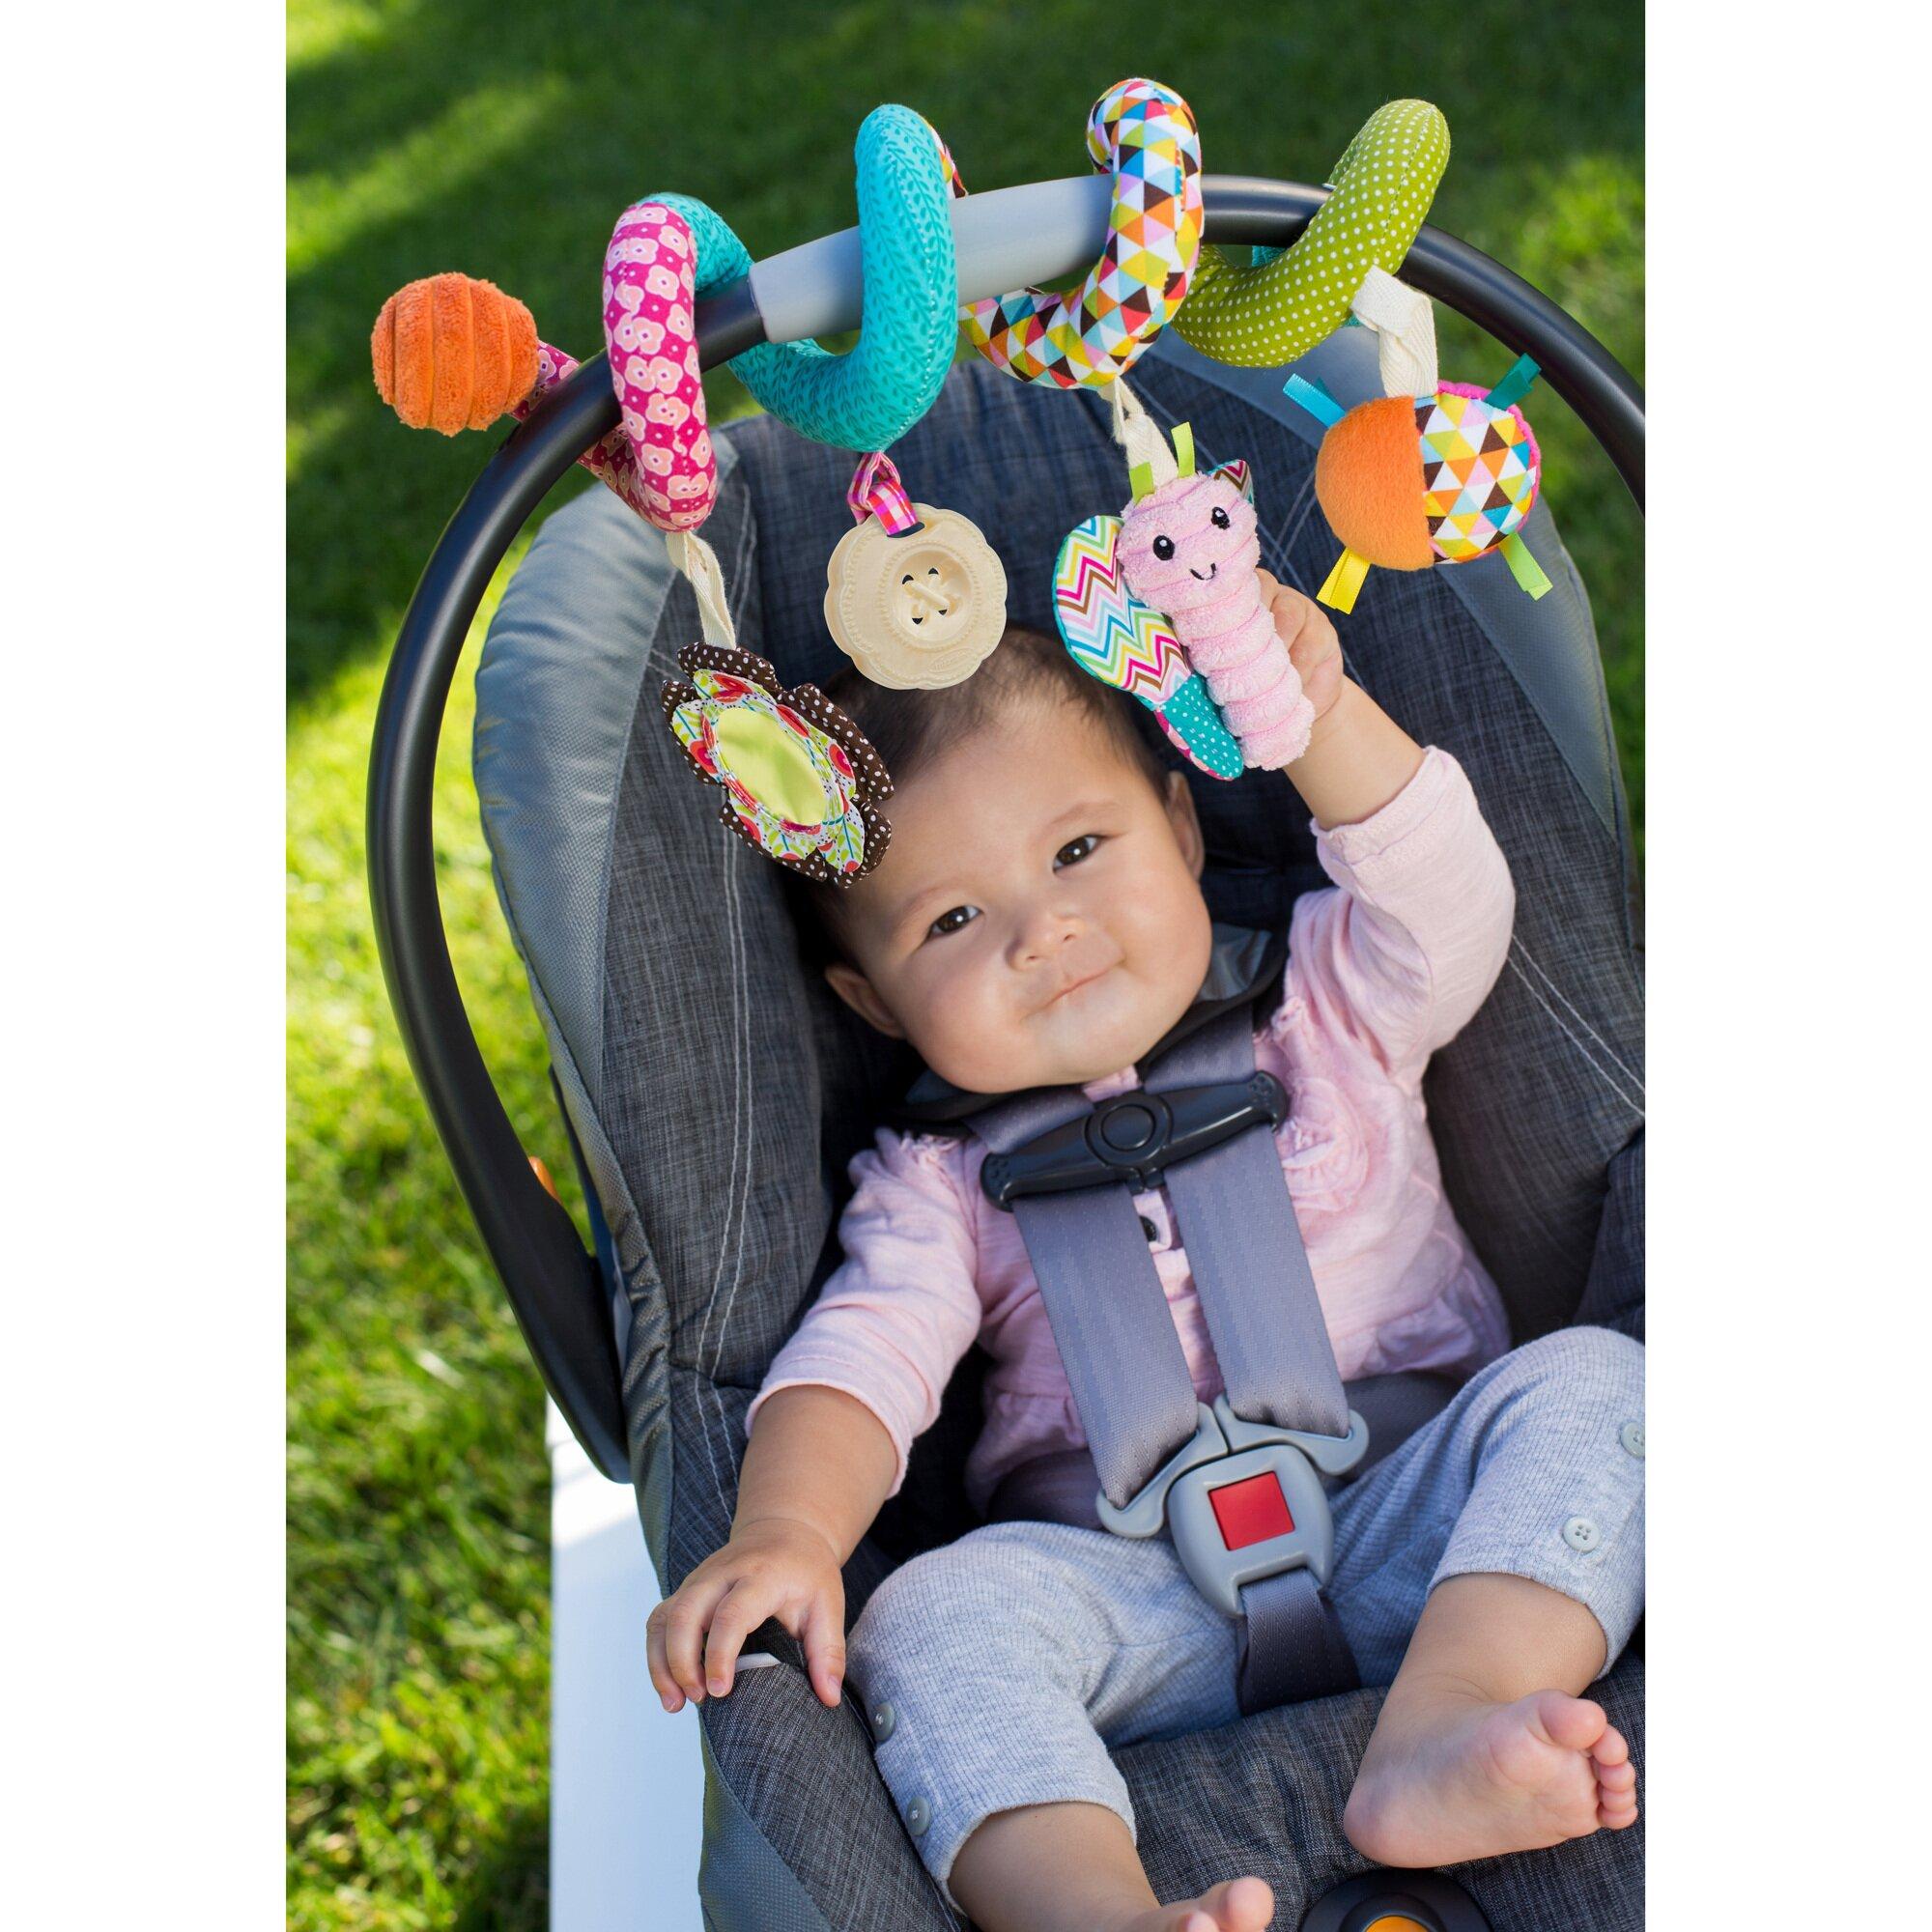 infantino-activity-spirale-schmetterling-go-gaga-mehrfarbig